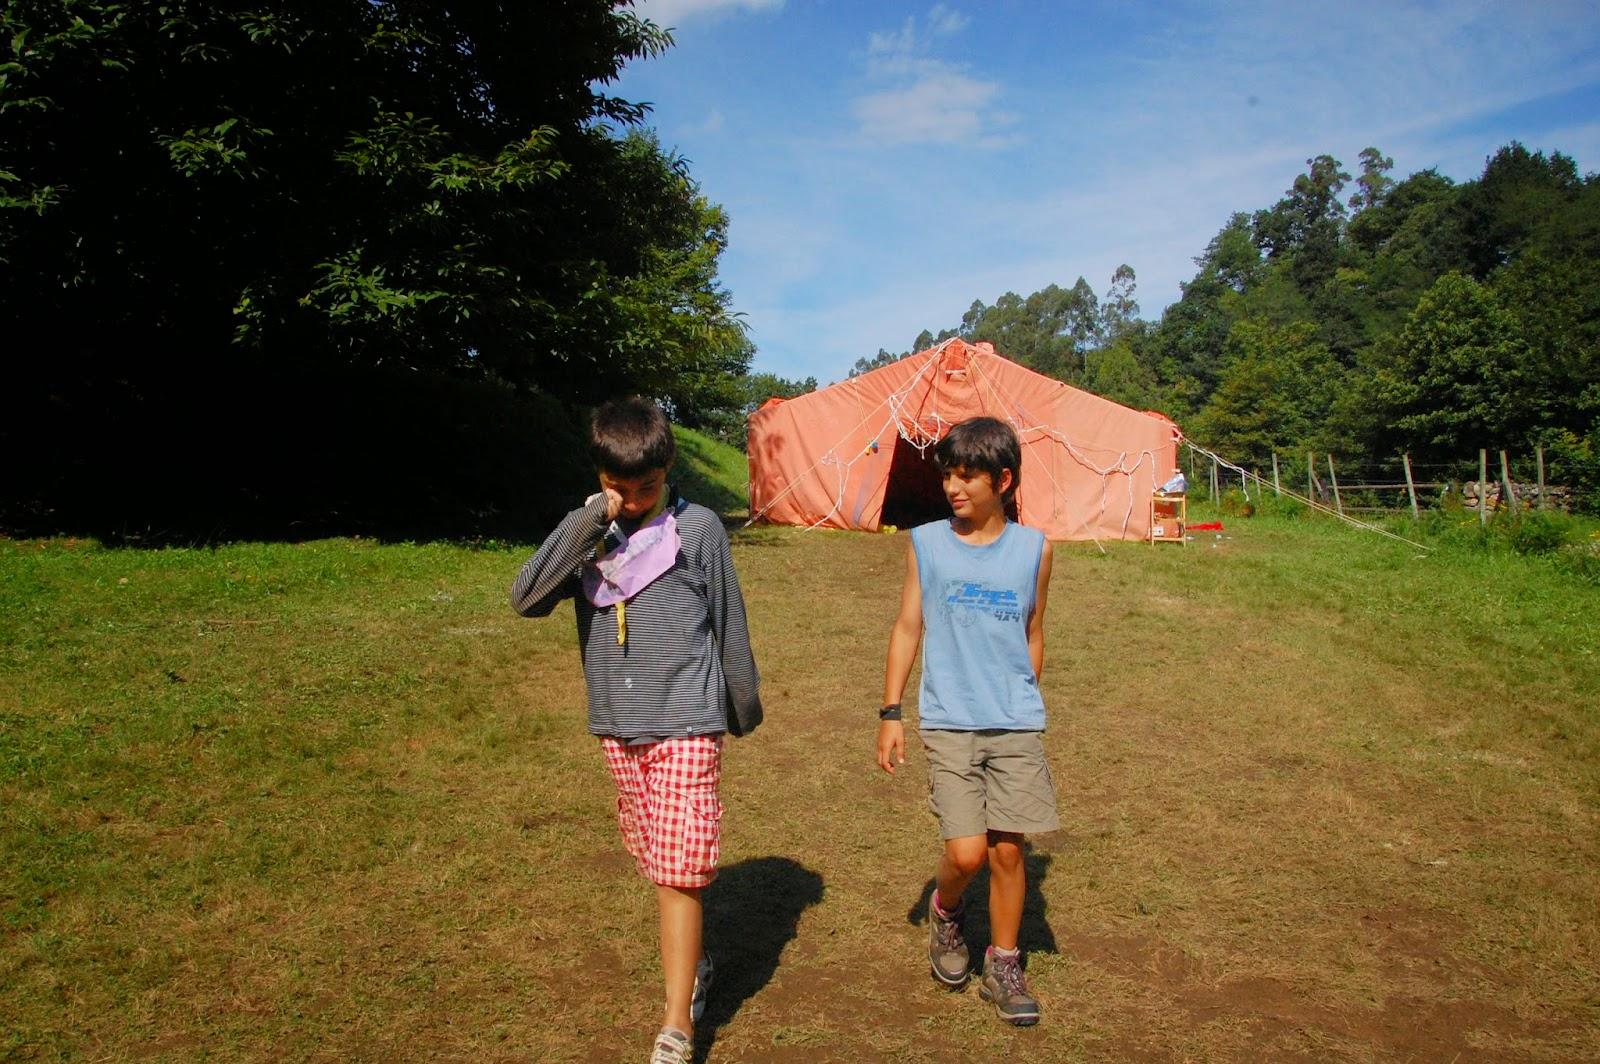 Campaments Estiu RolandKing 2011 - DSC_0138.JPG